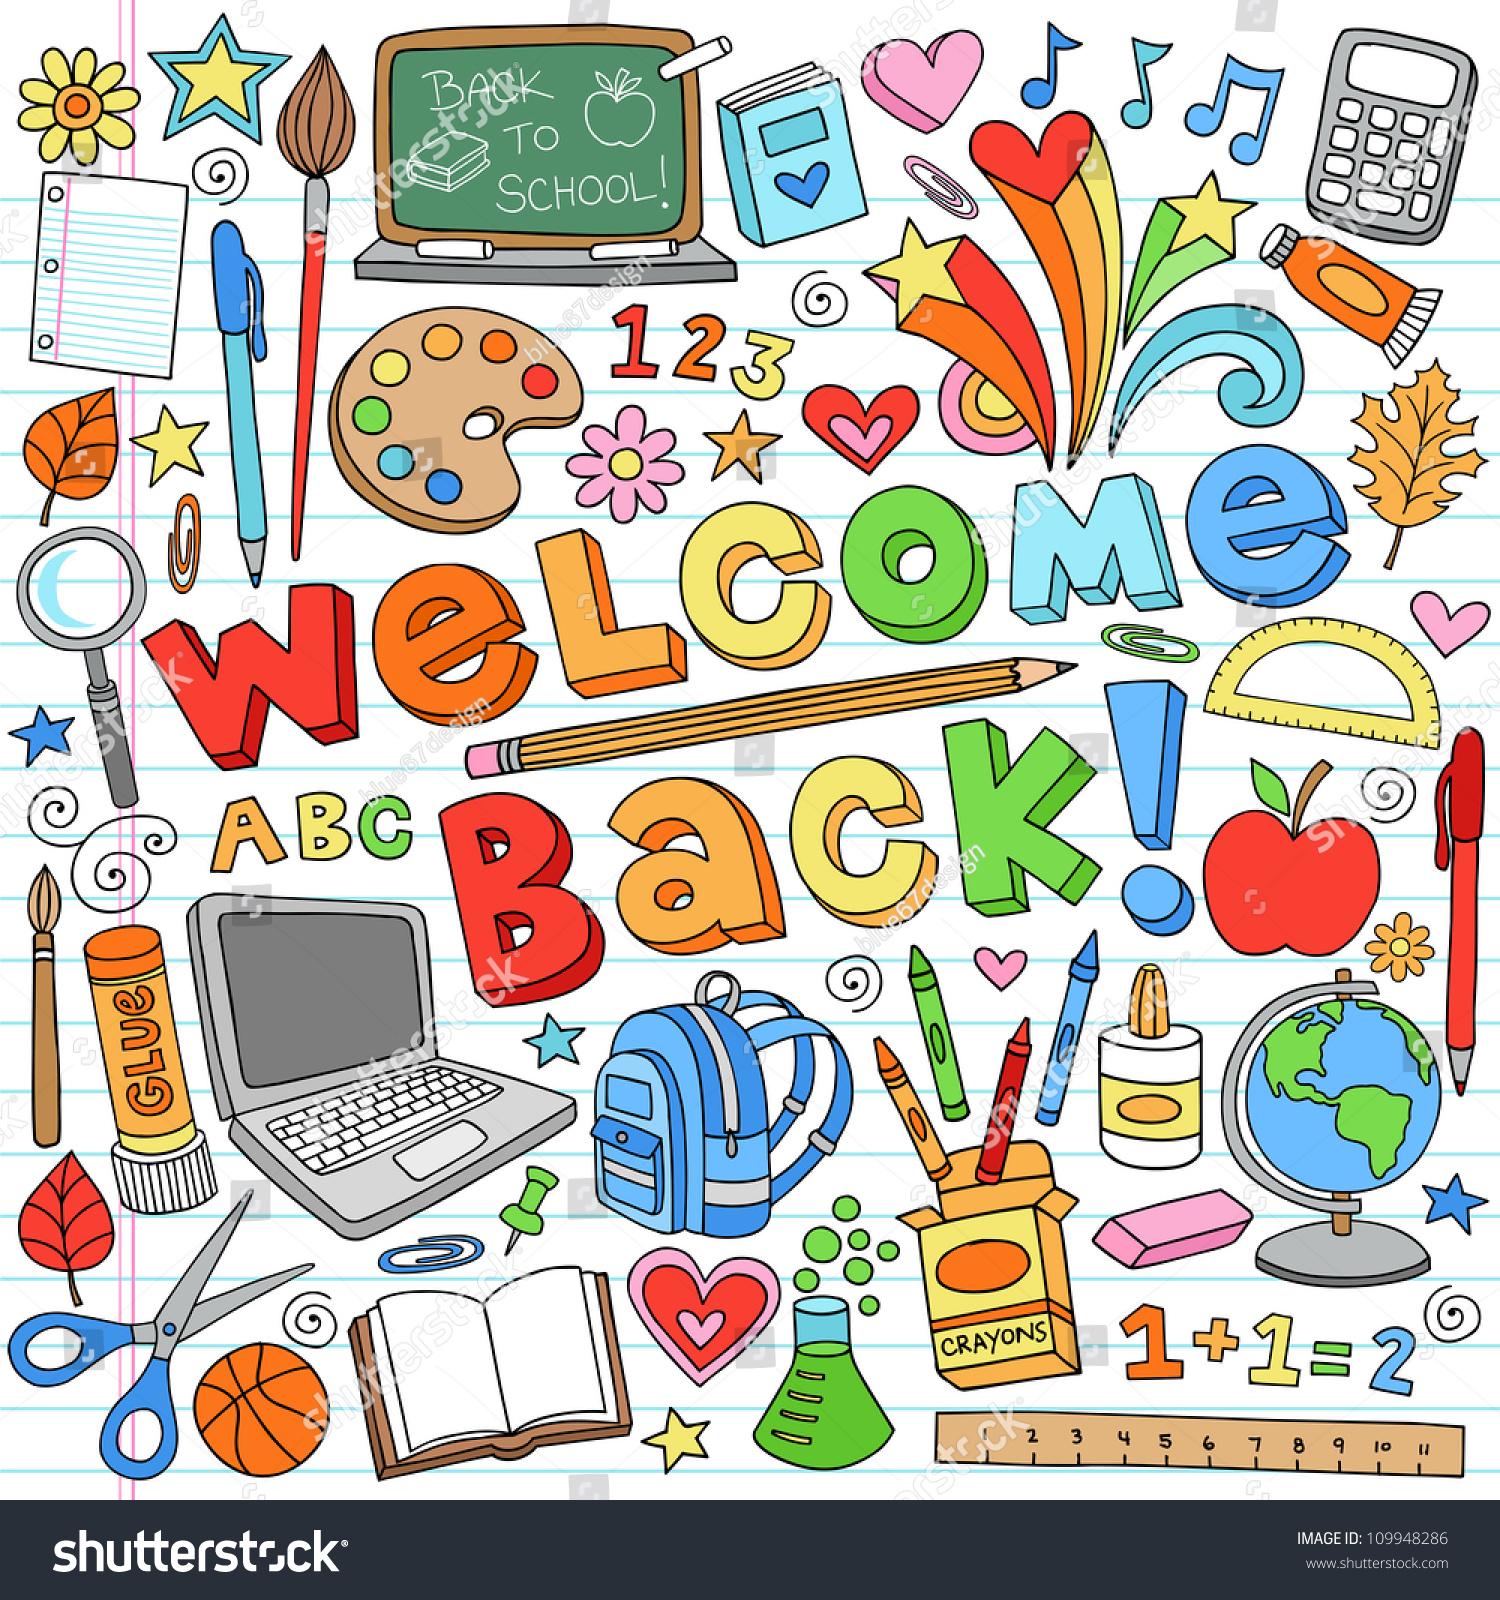 Classroom Design Elements ~ Welcome back school classroom supplies notebook stock